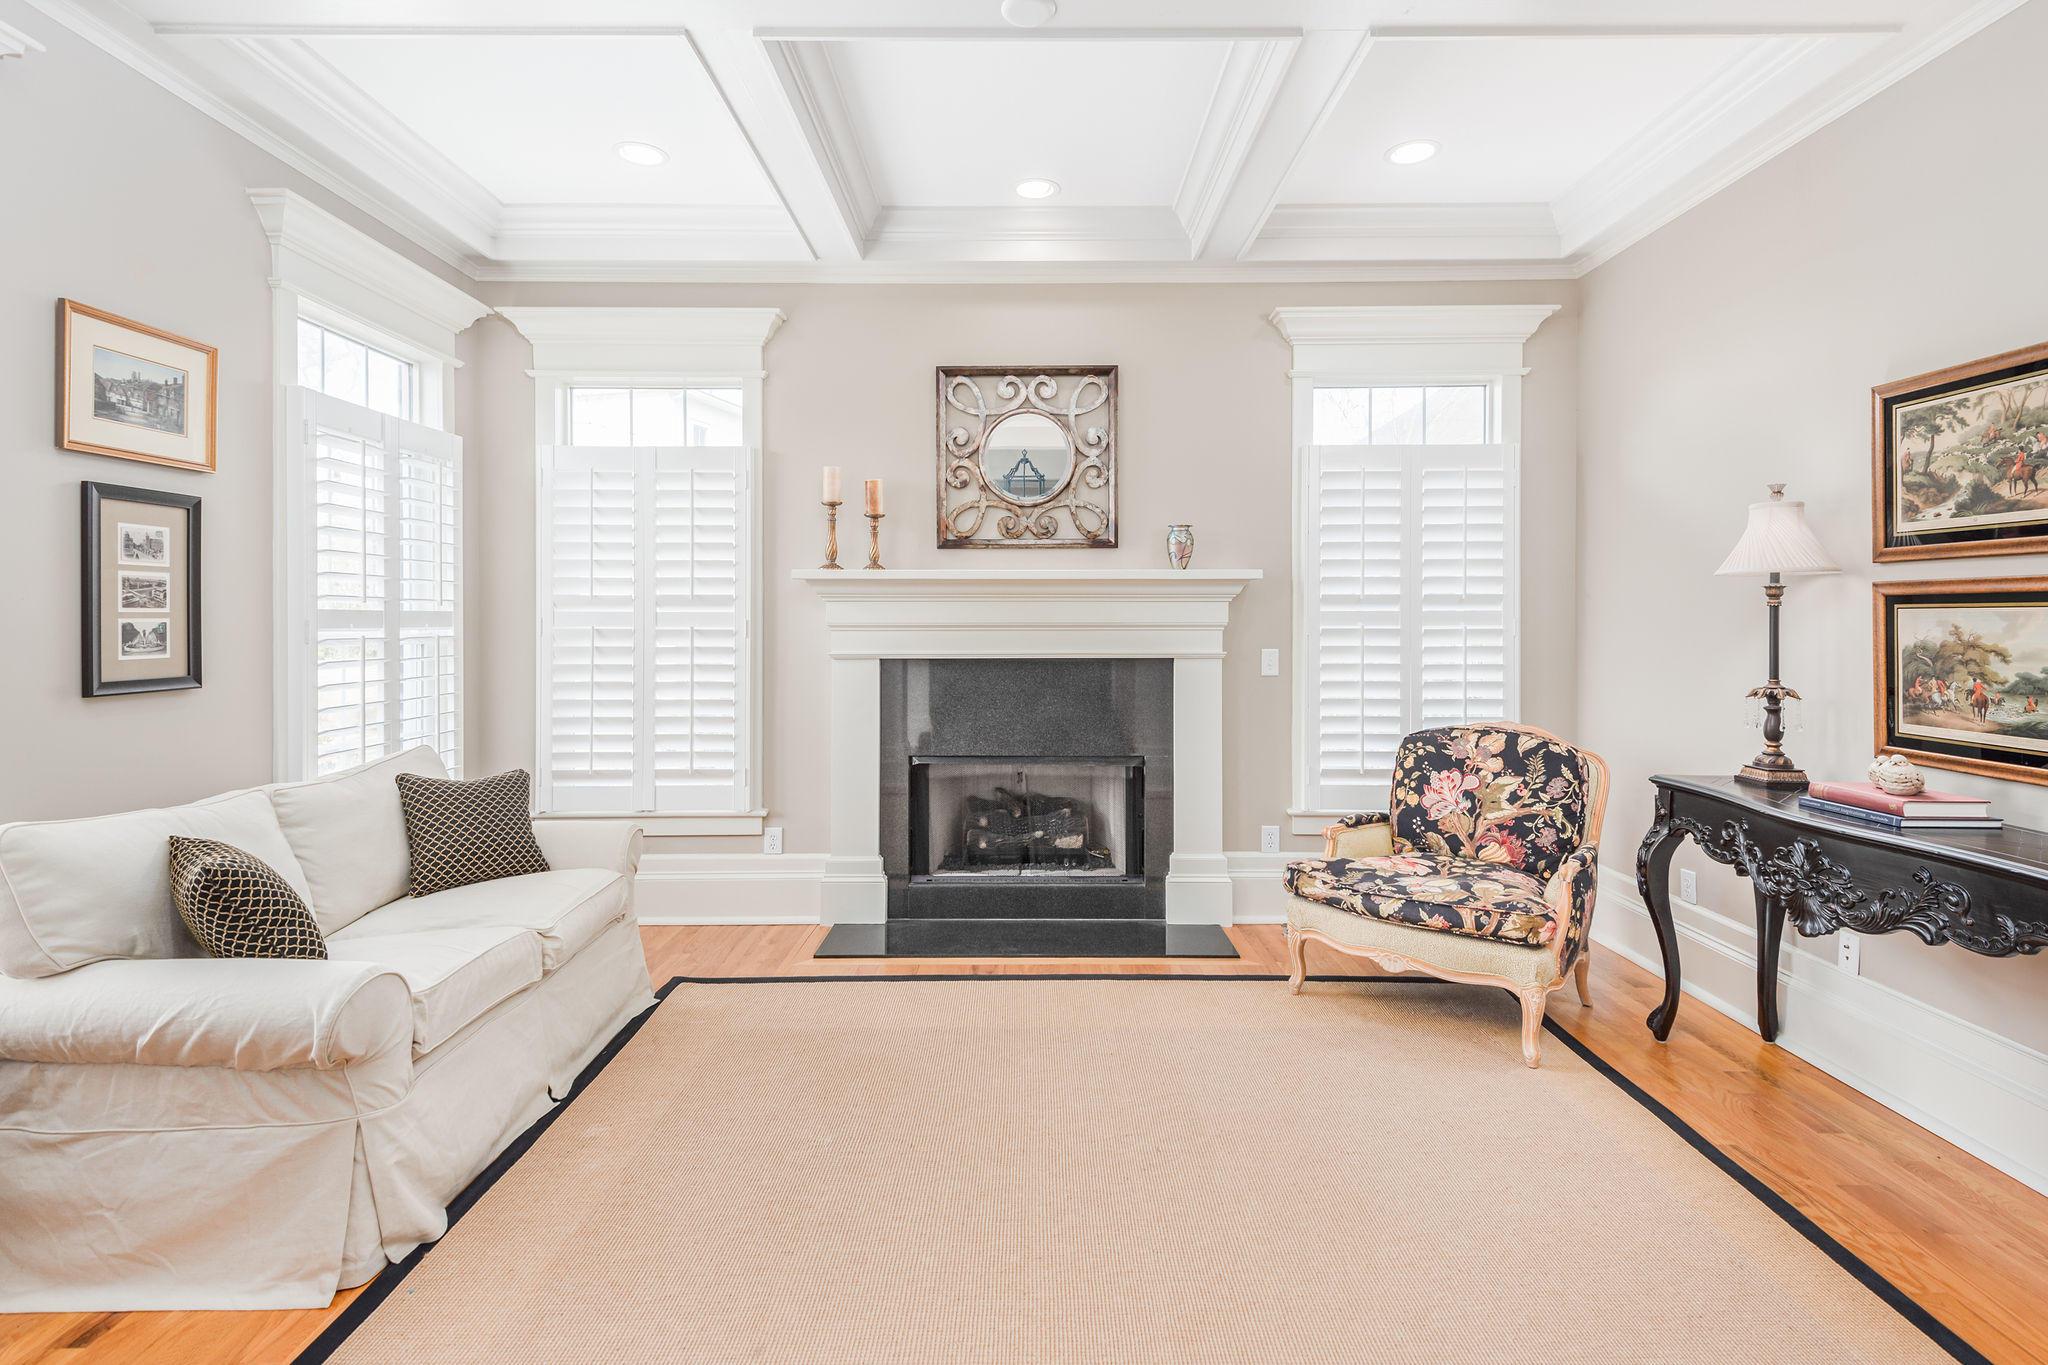 Dunes West Homes For Sale - 1305 King Bird, Mount Pleasant, SC - 48